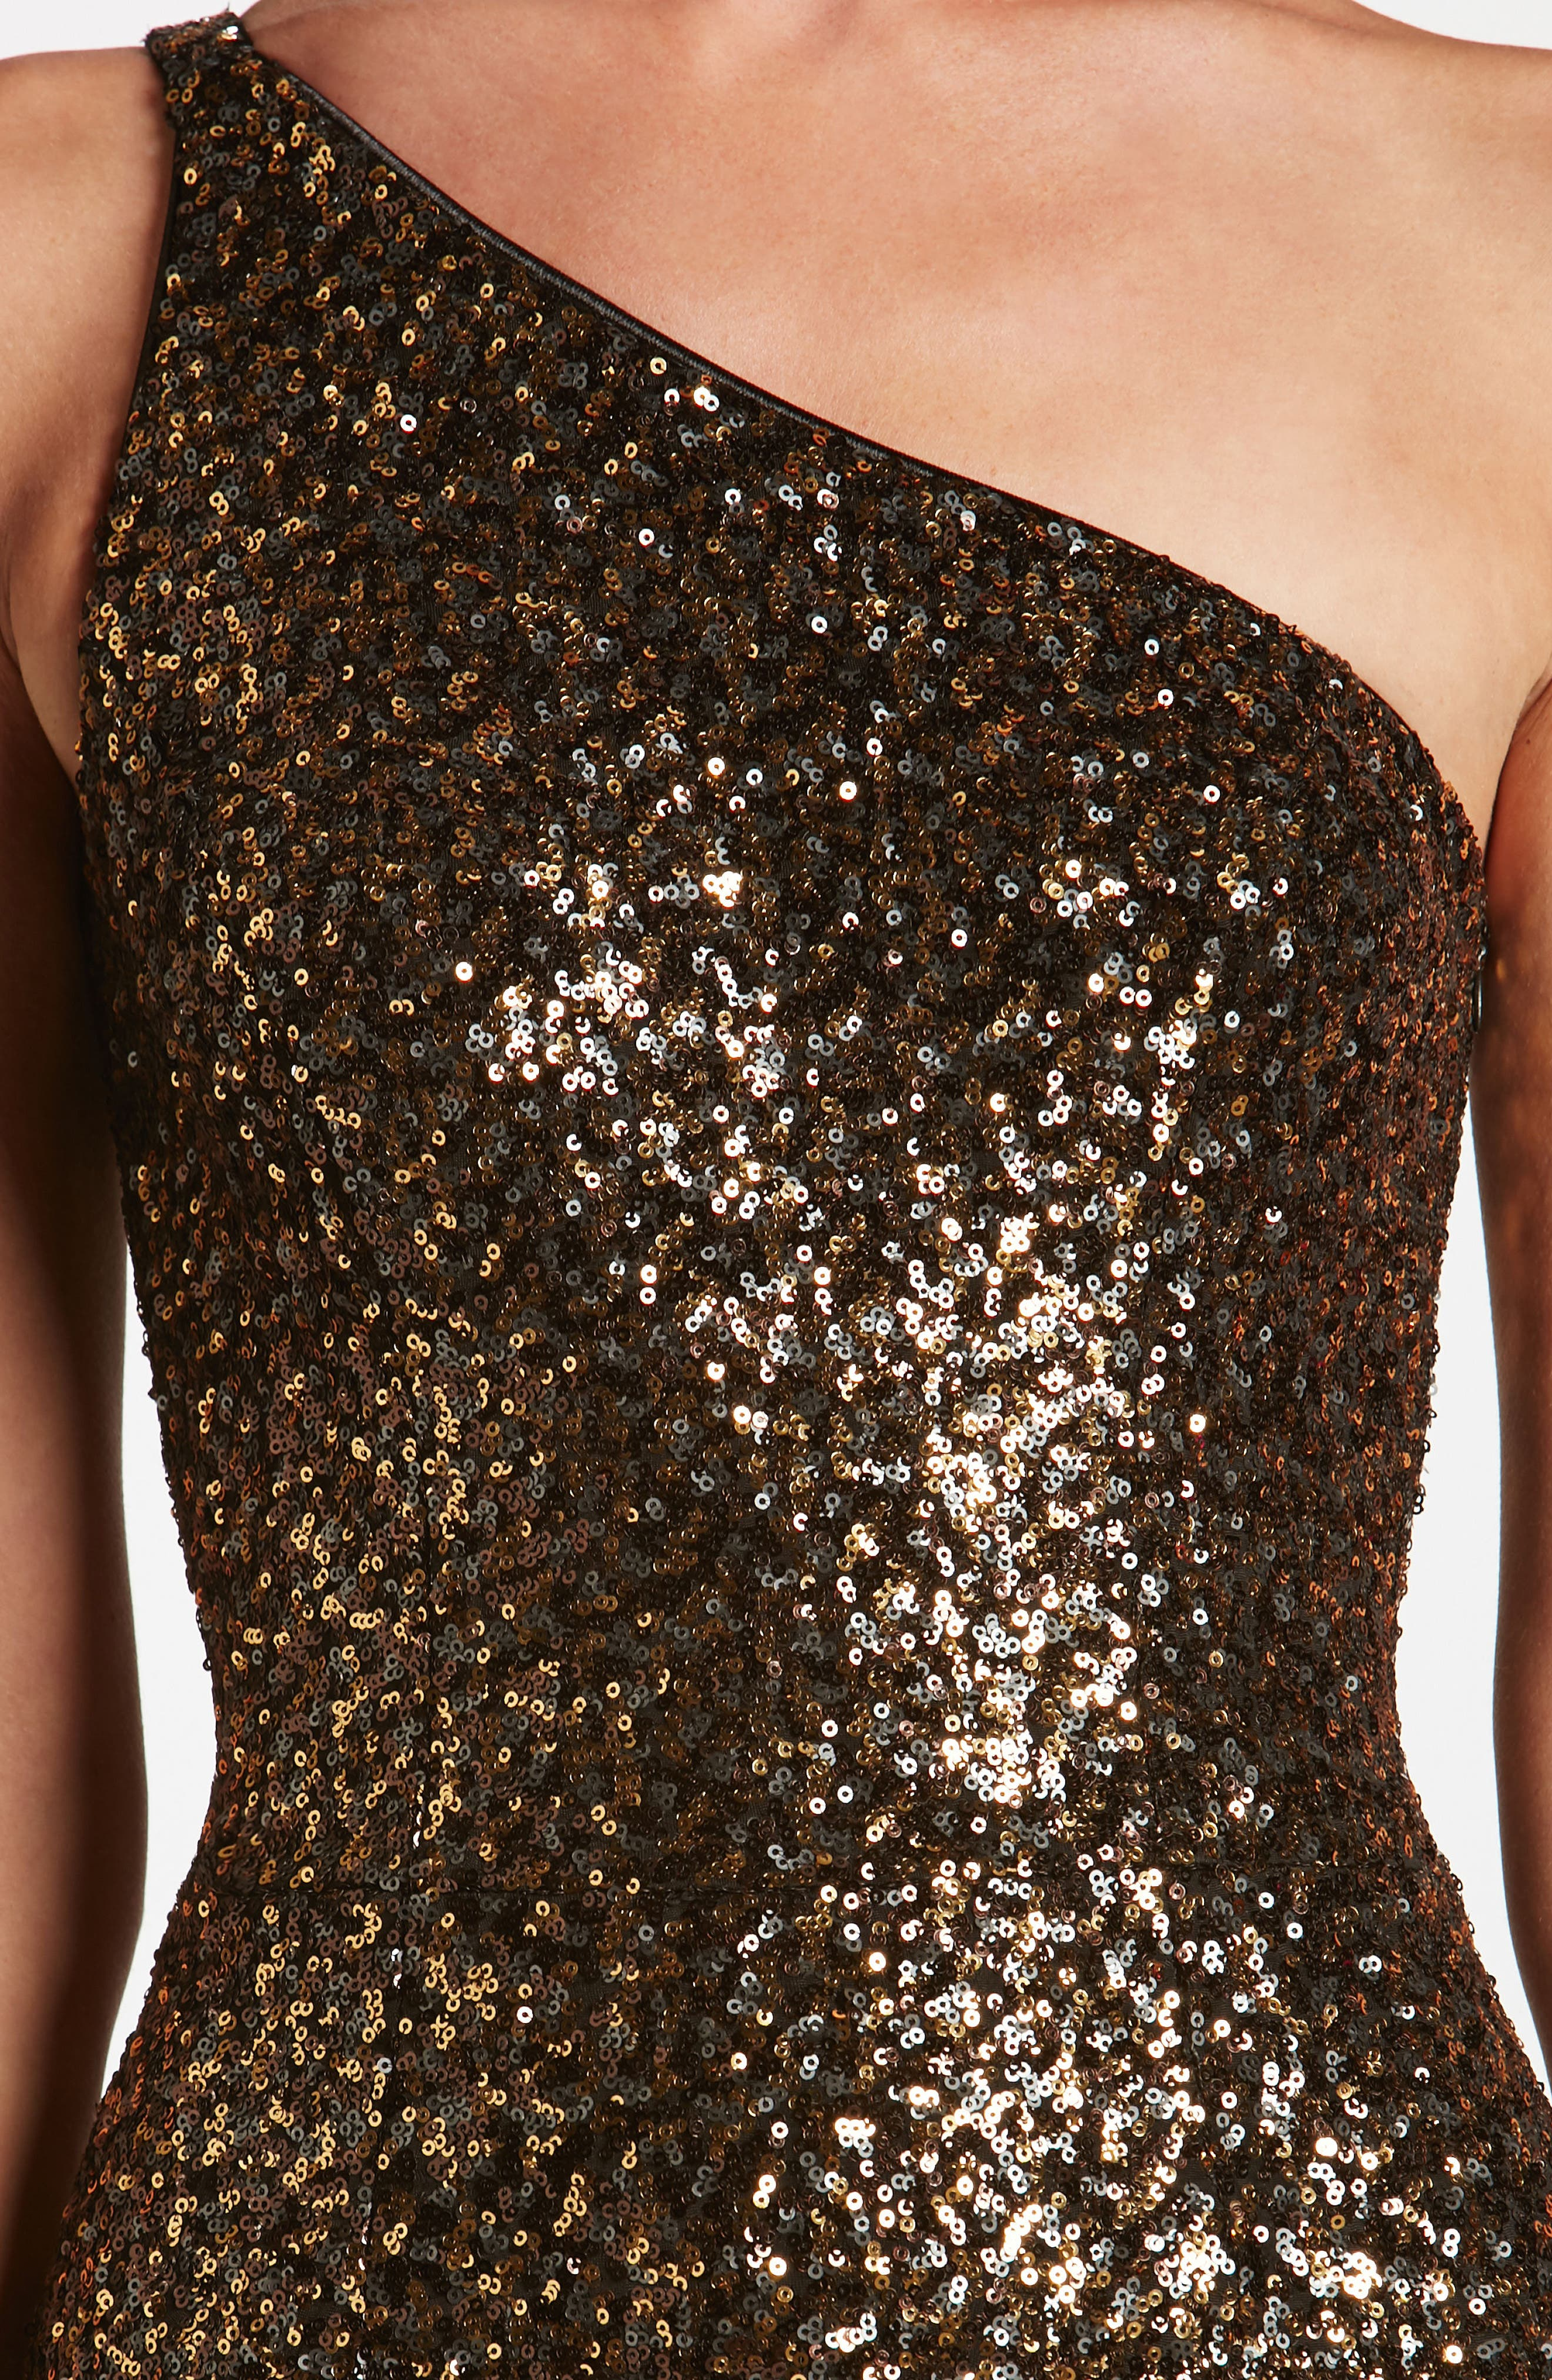 Cher One-Shoulder Sequin Body-Con Dress,                             Alternate thumbnail 5, color,                             Antique Gold